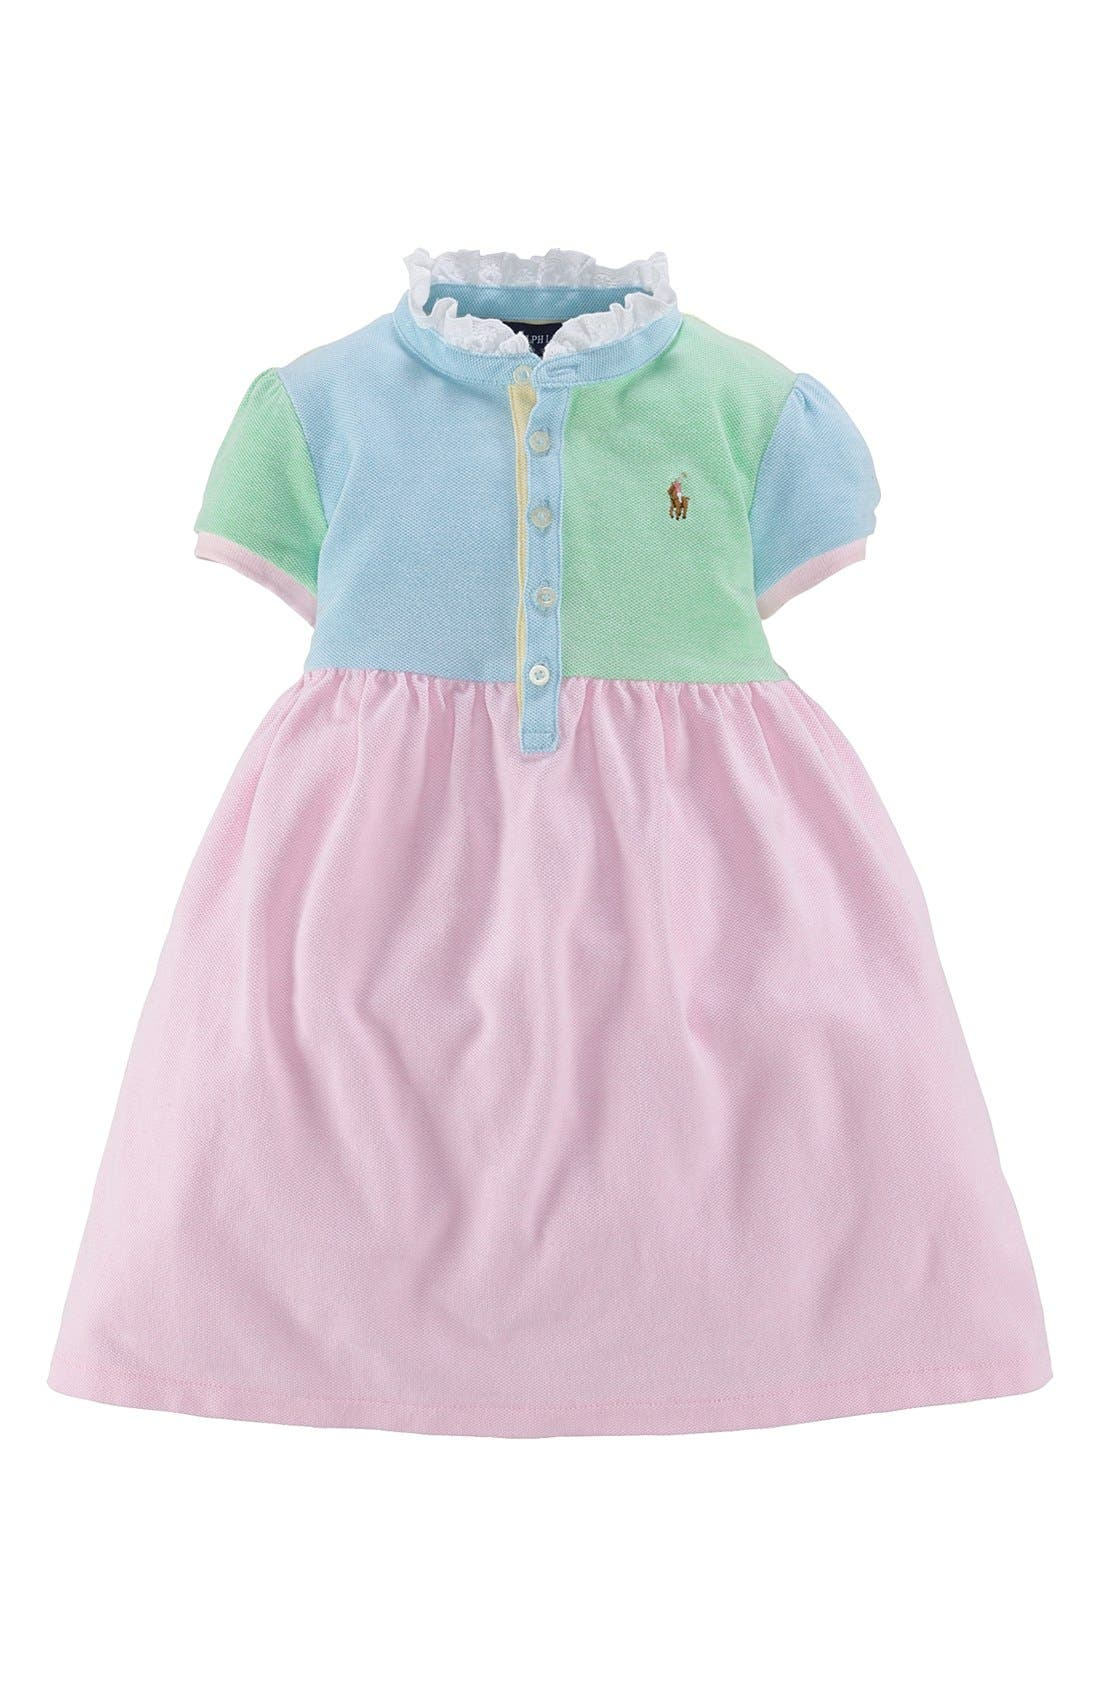 Alternate Image 1 Selected - Ralph Lauren Colorblock Dress (Toddler Girls)